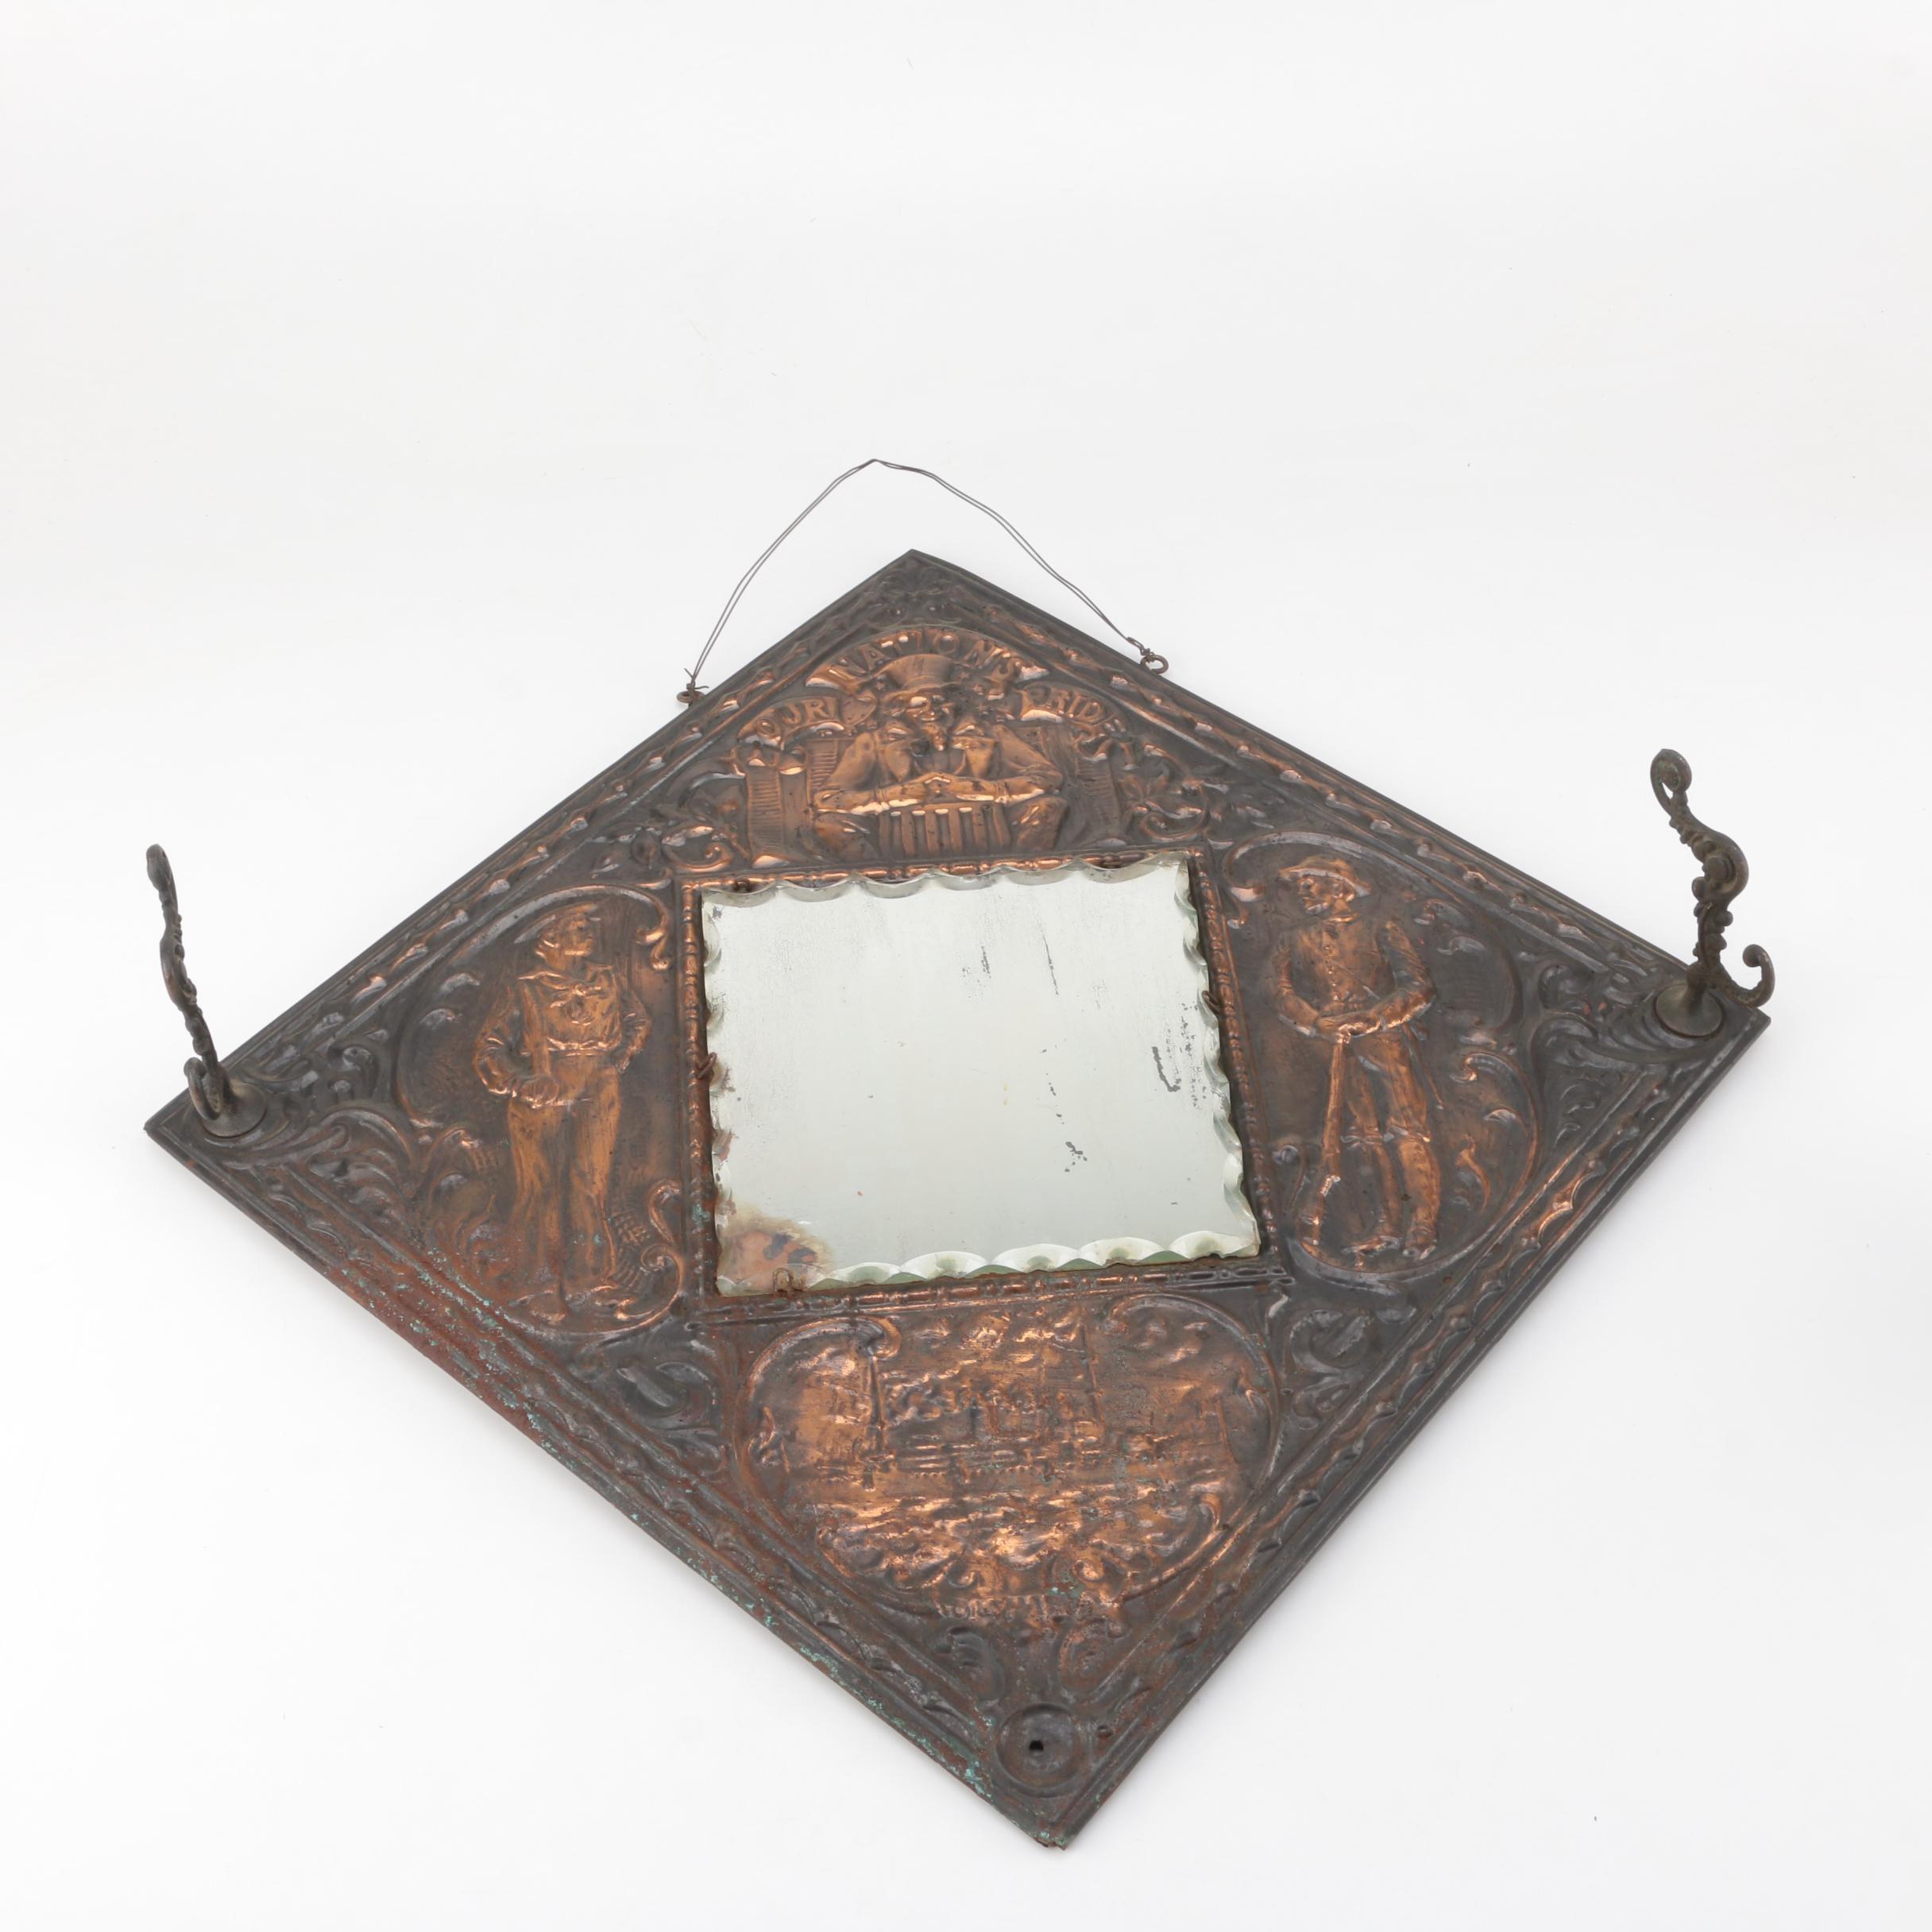 Spanish-American War Mirror